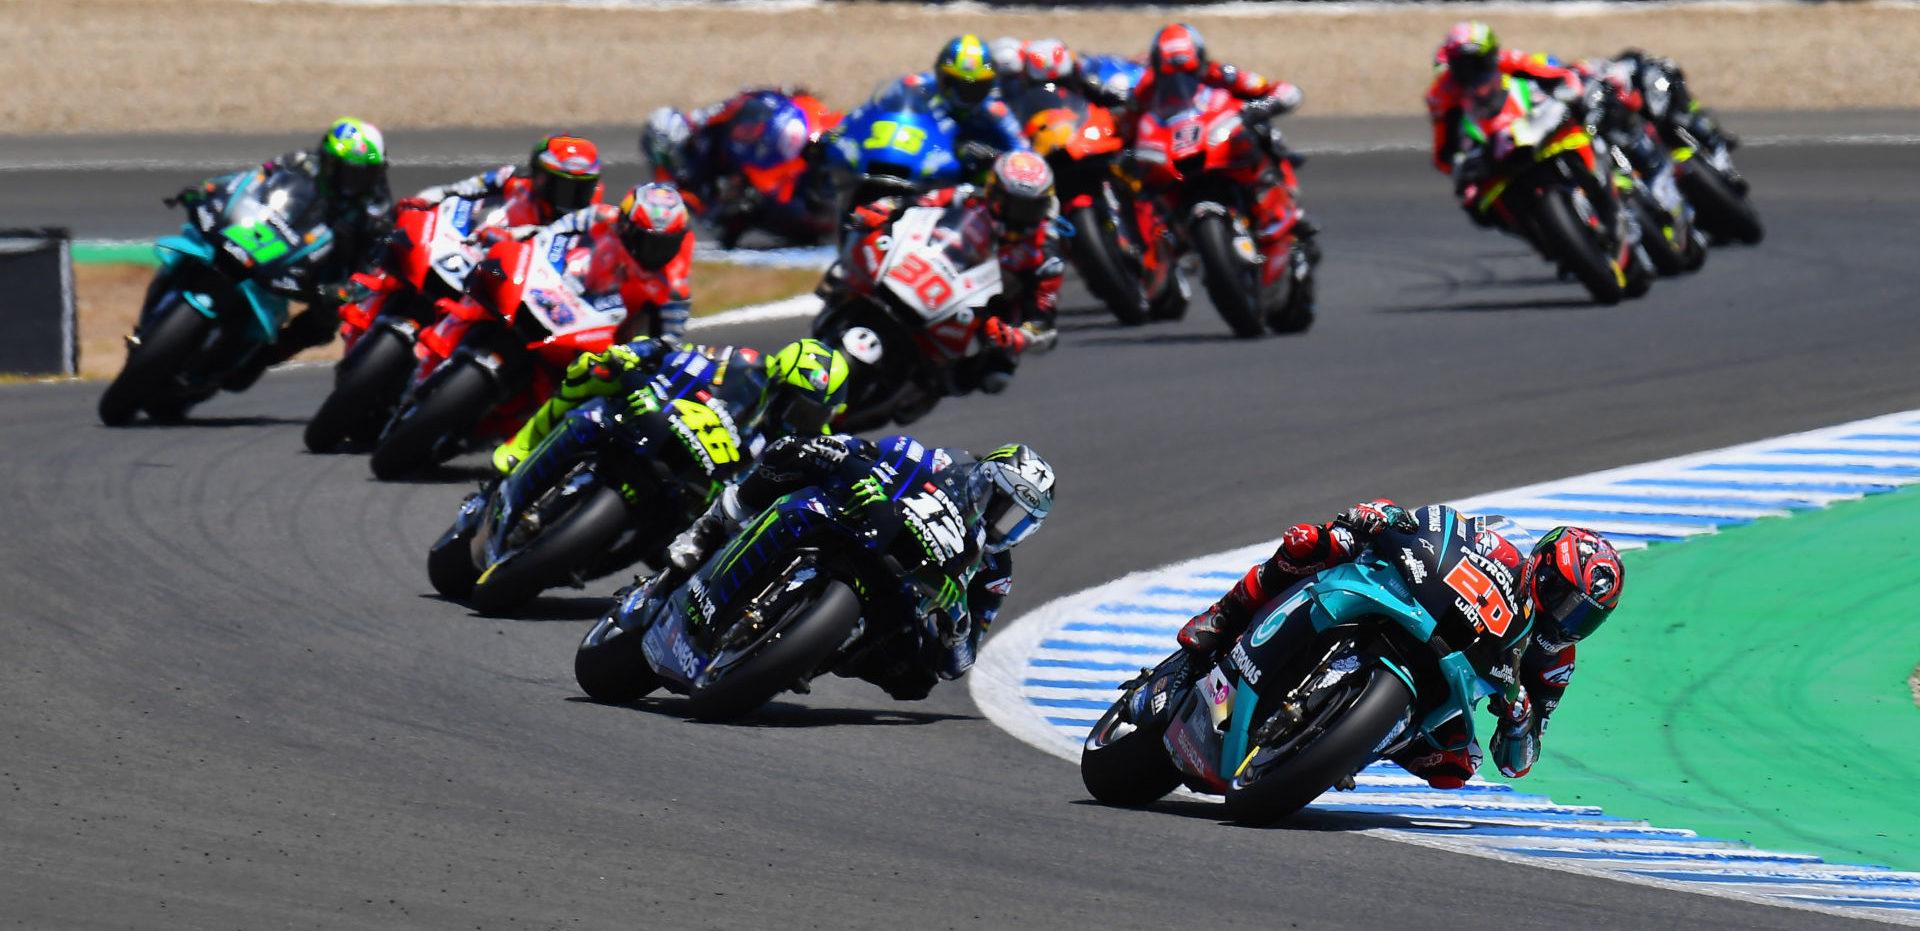 The start of the MotoGP race at Jerez II. Photo courtesy Michelin.